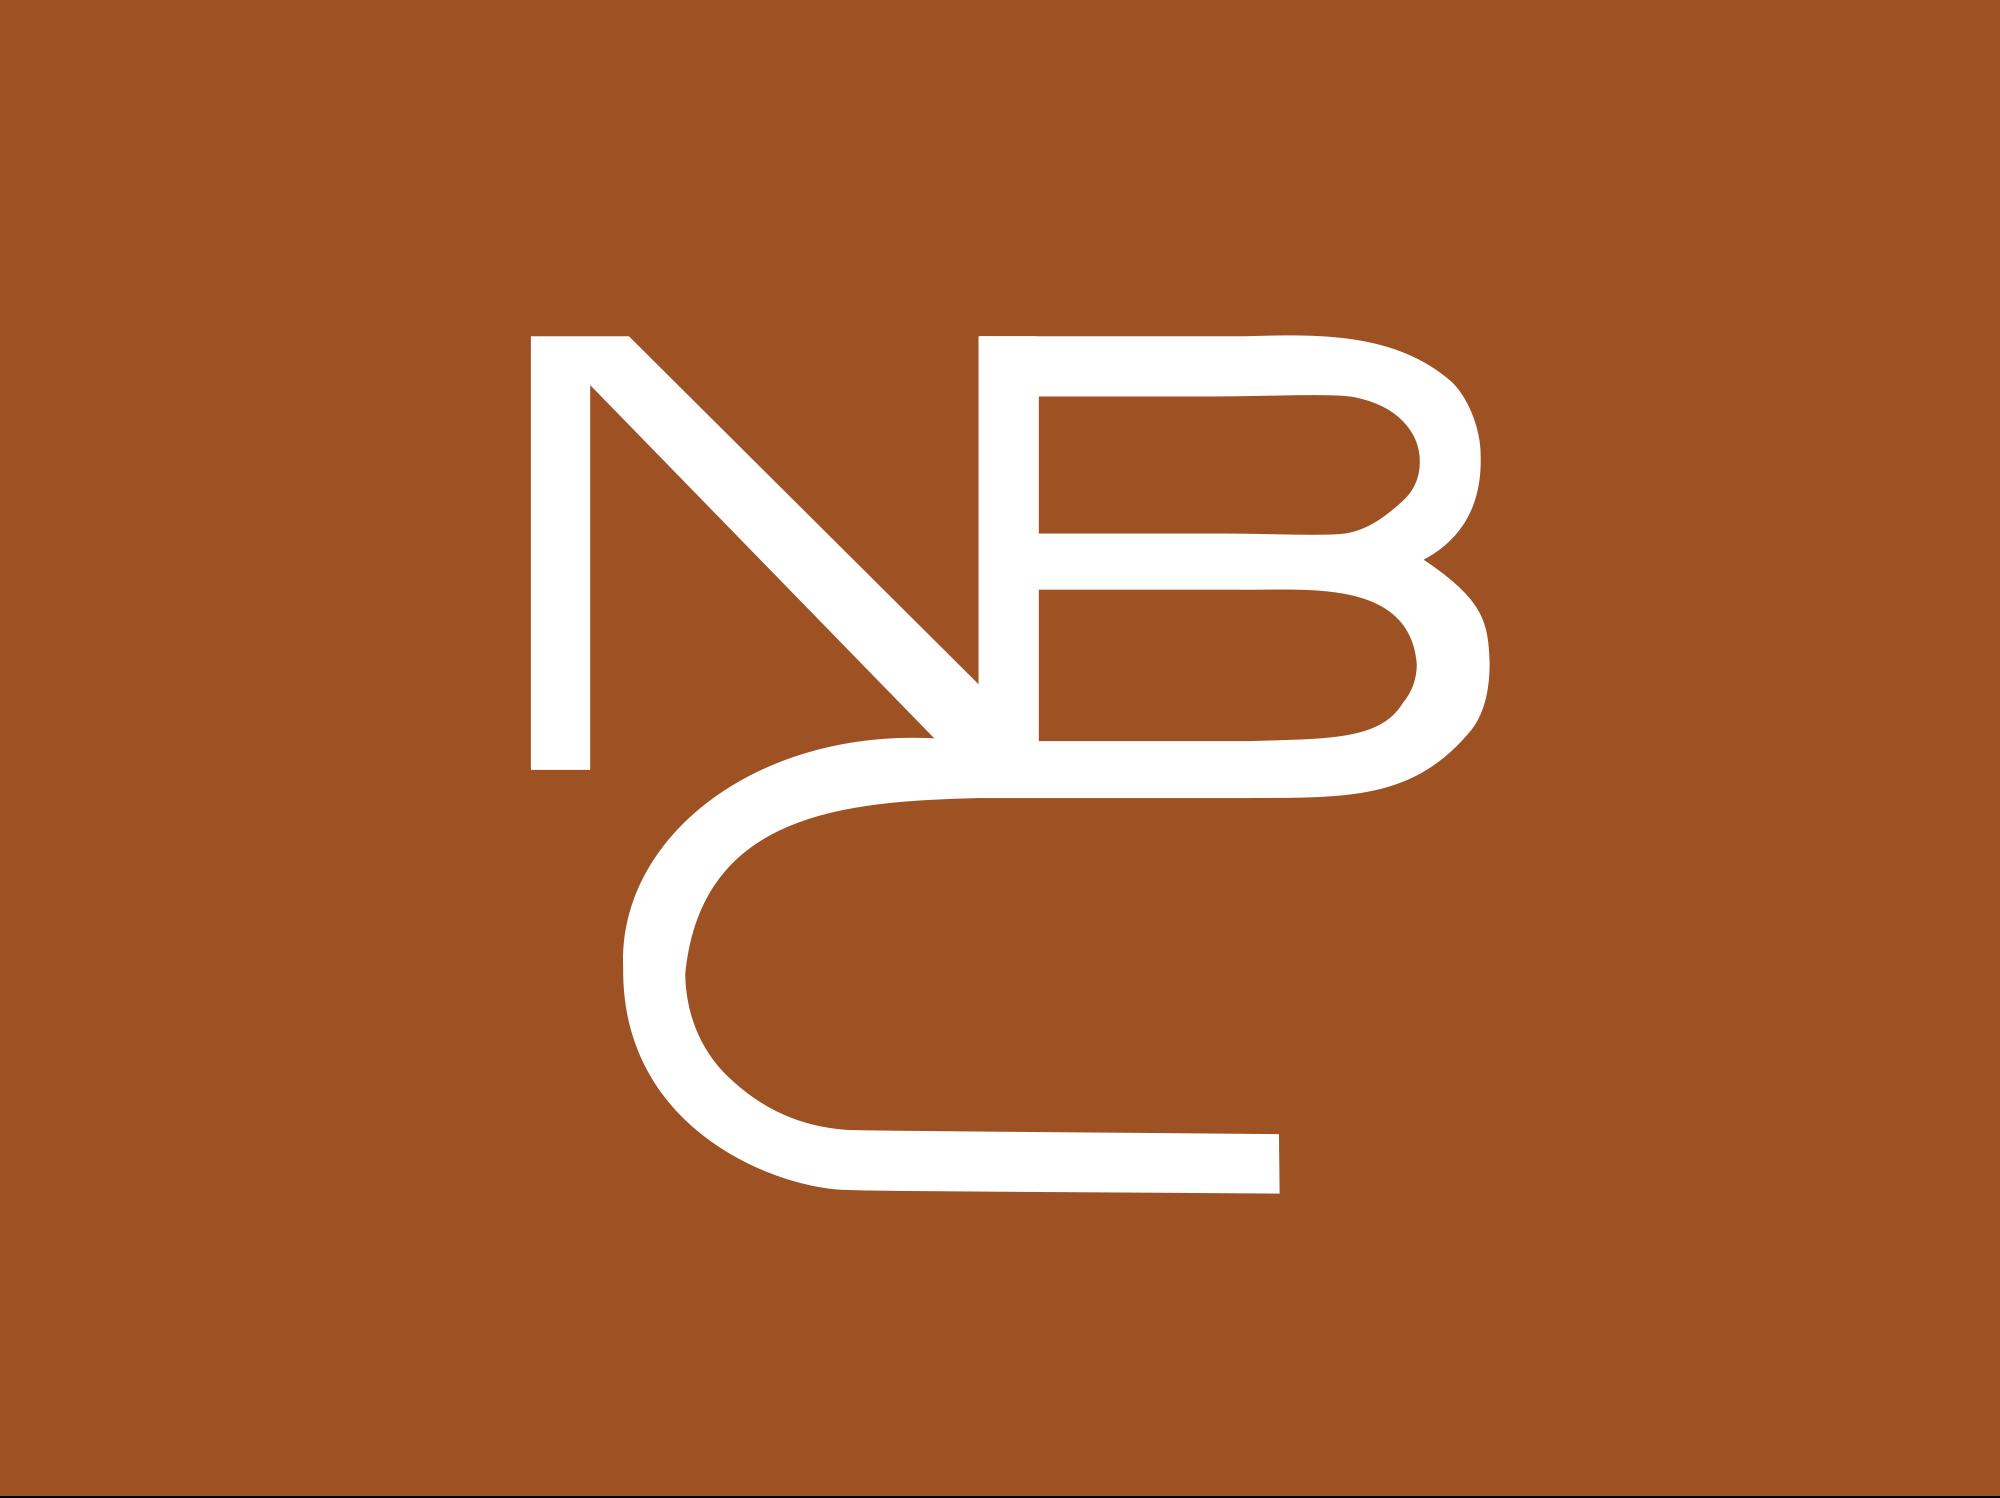 Image - 1959 NBC logo.png.png - Logopedia, the logo and branding site